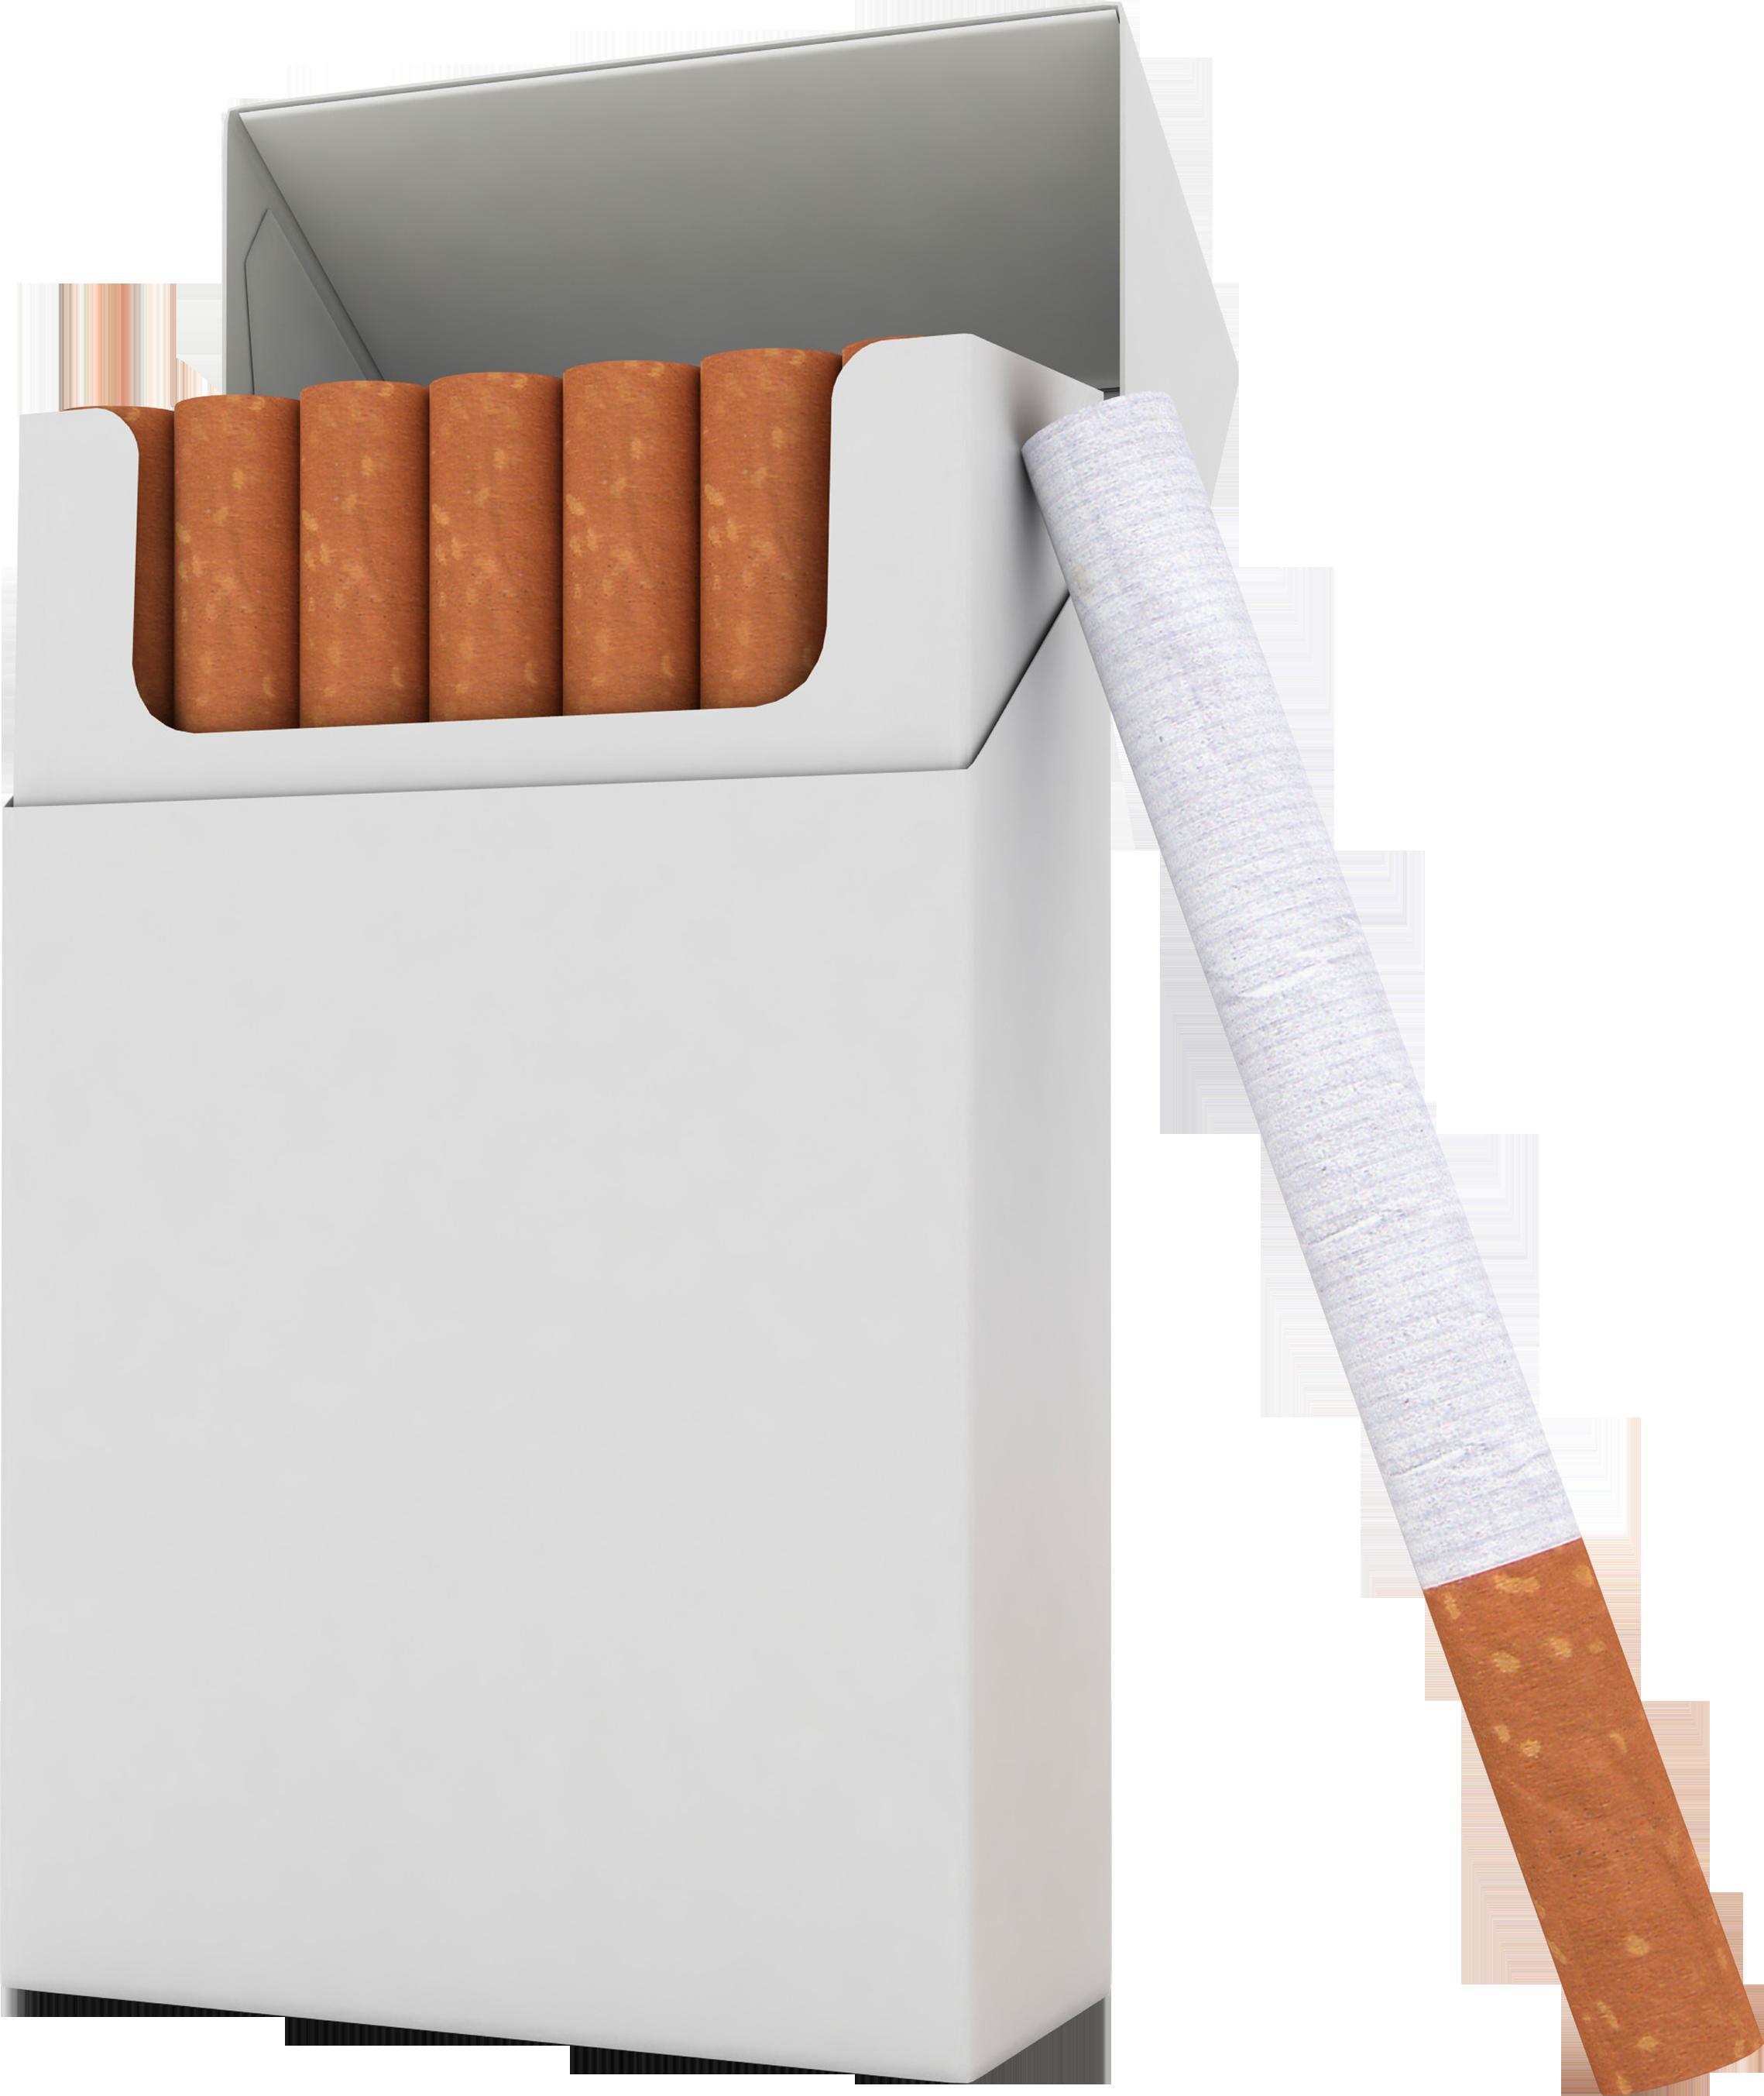 Drawn cigarette transparent background #4